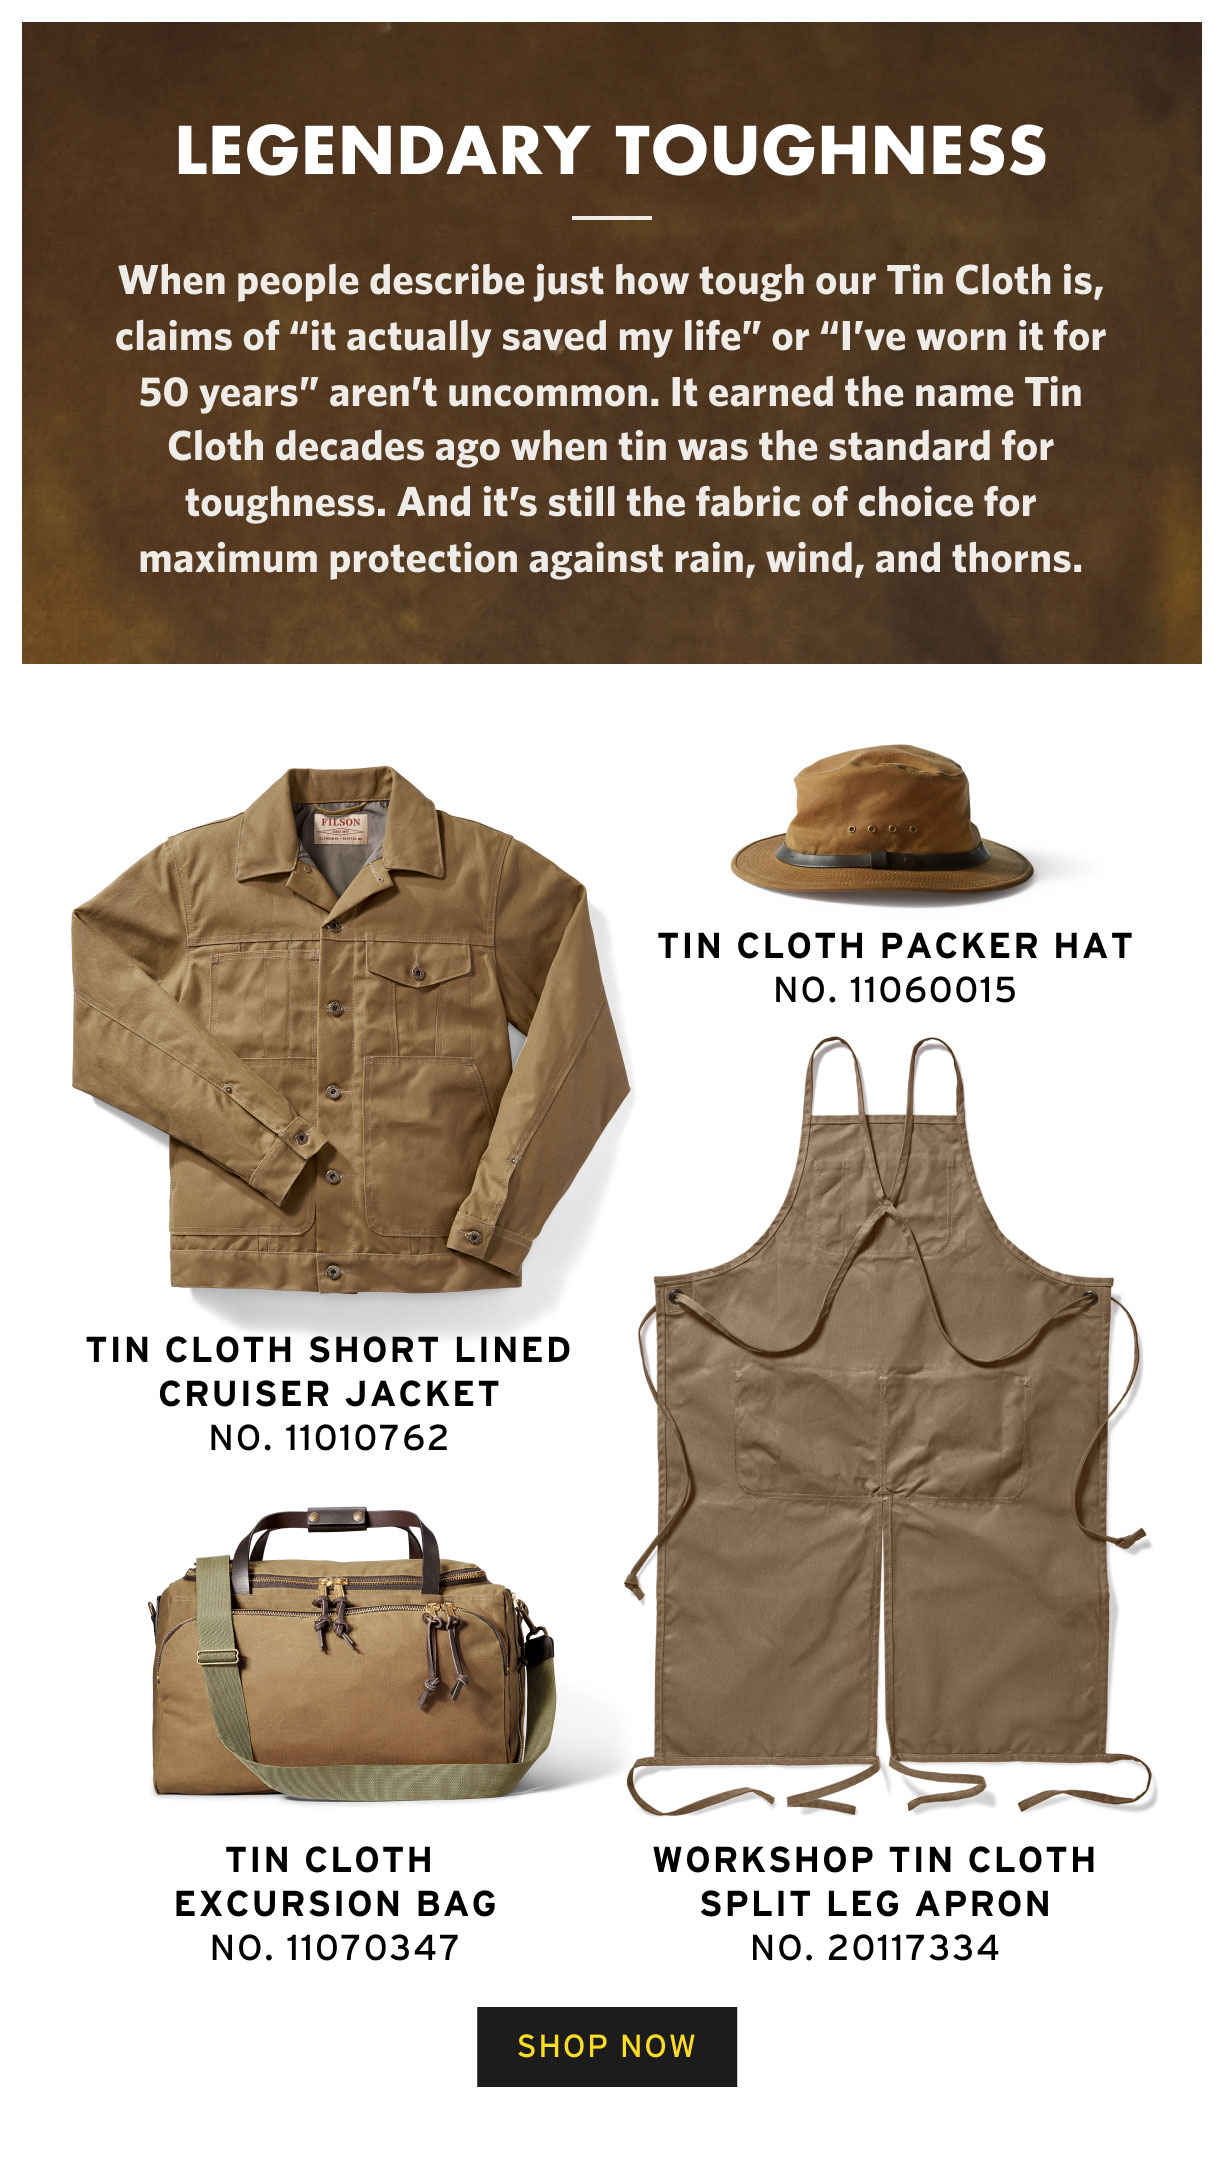 SHOP TIN CLOTH